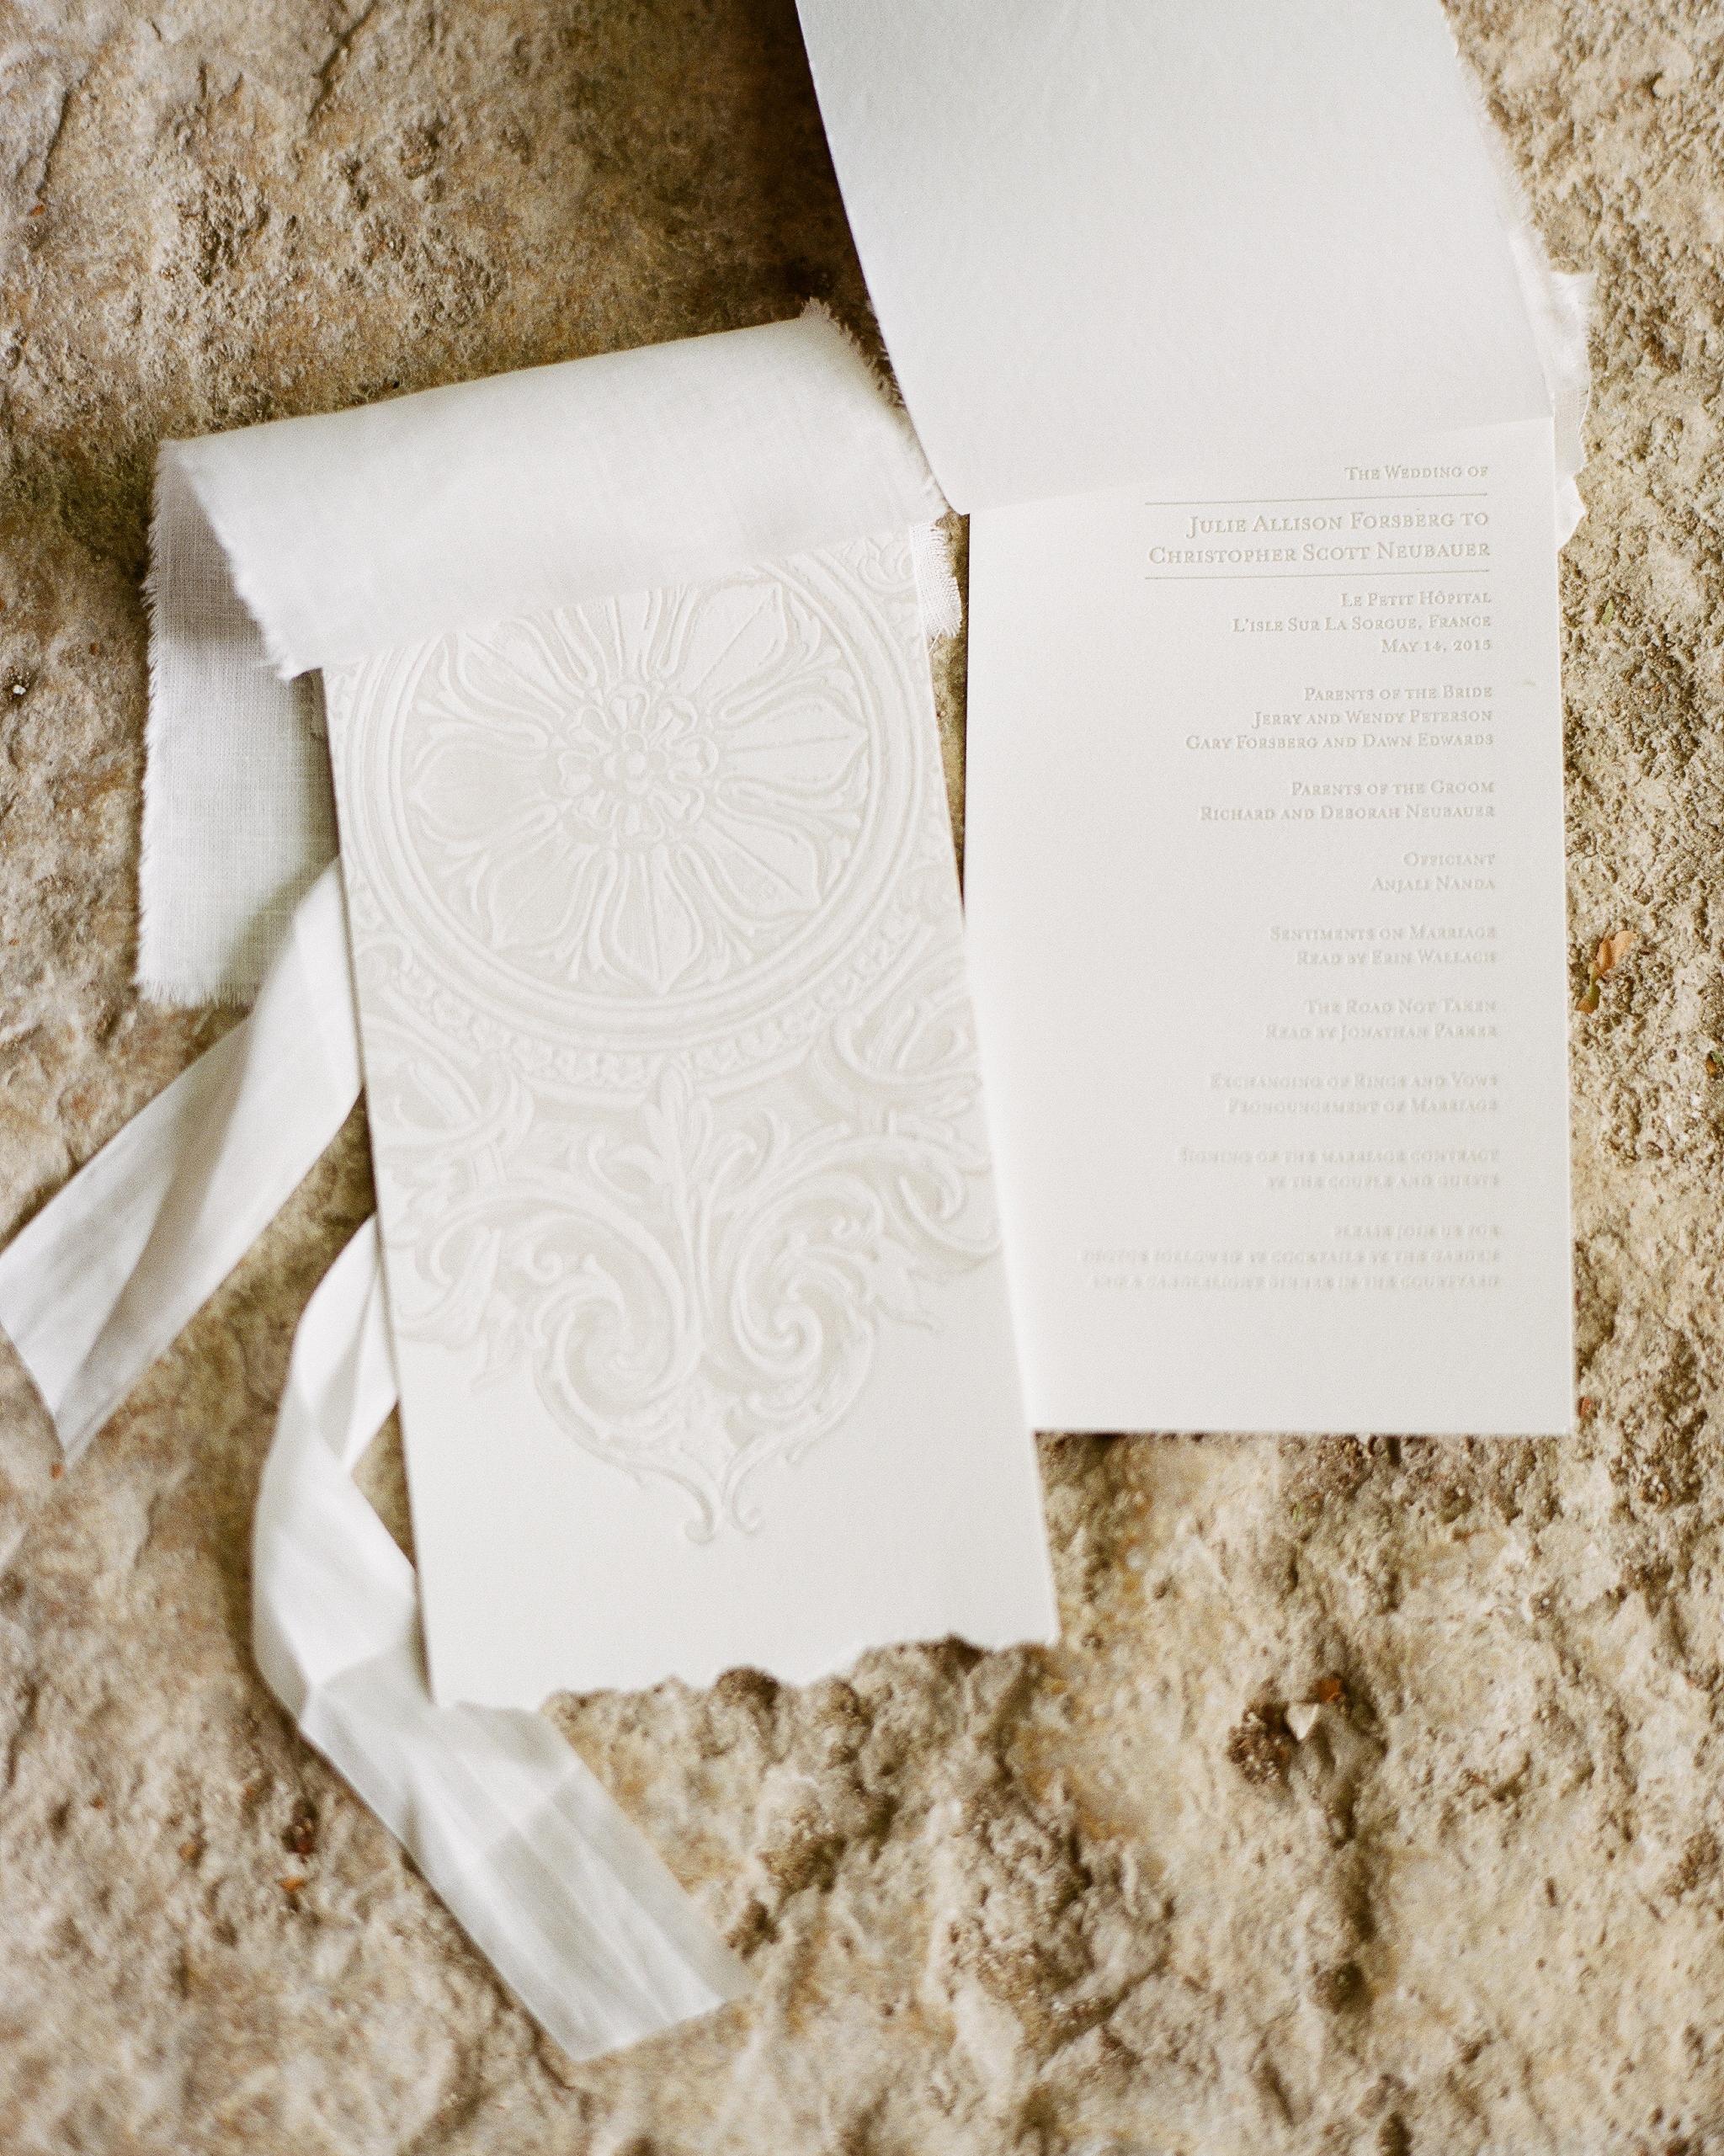 julie-chris-wedding-programs-1797-s12649-0216.jpg